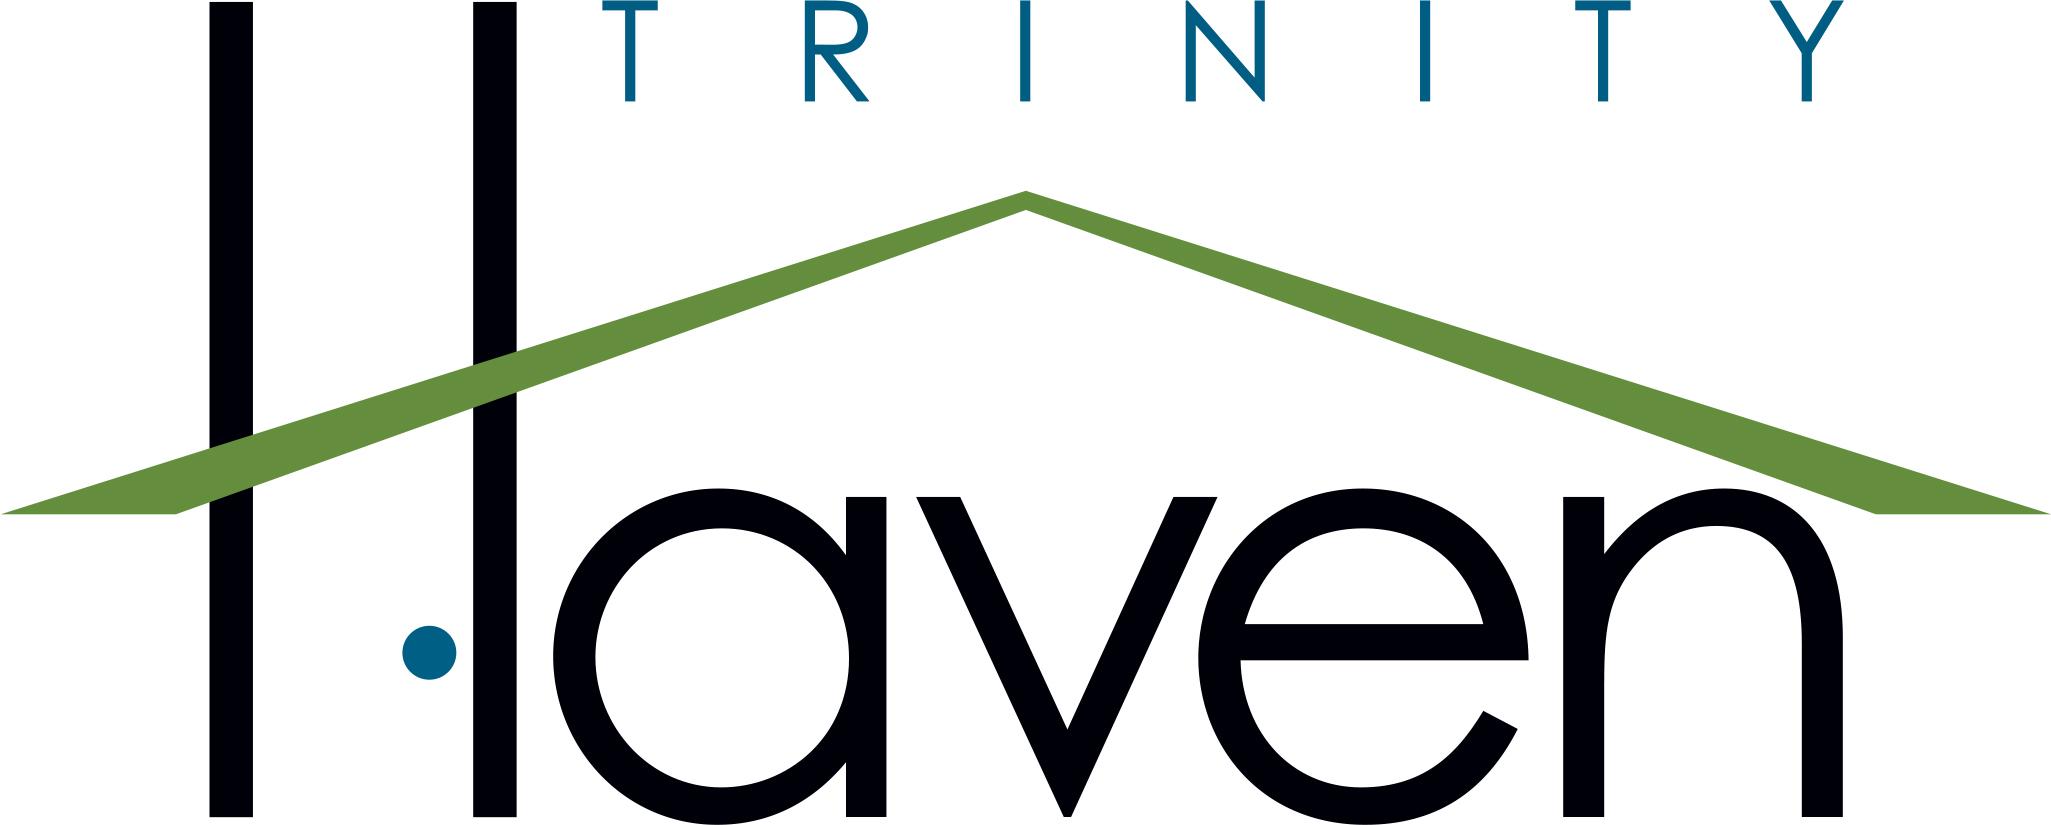 Trinity Haven